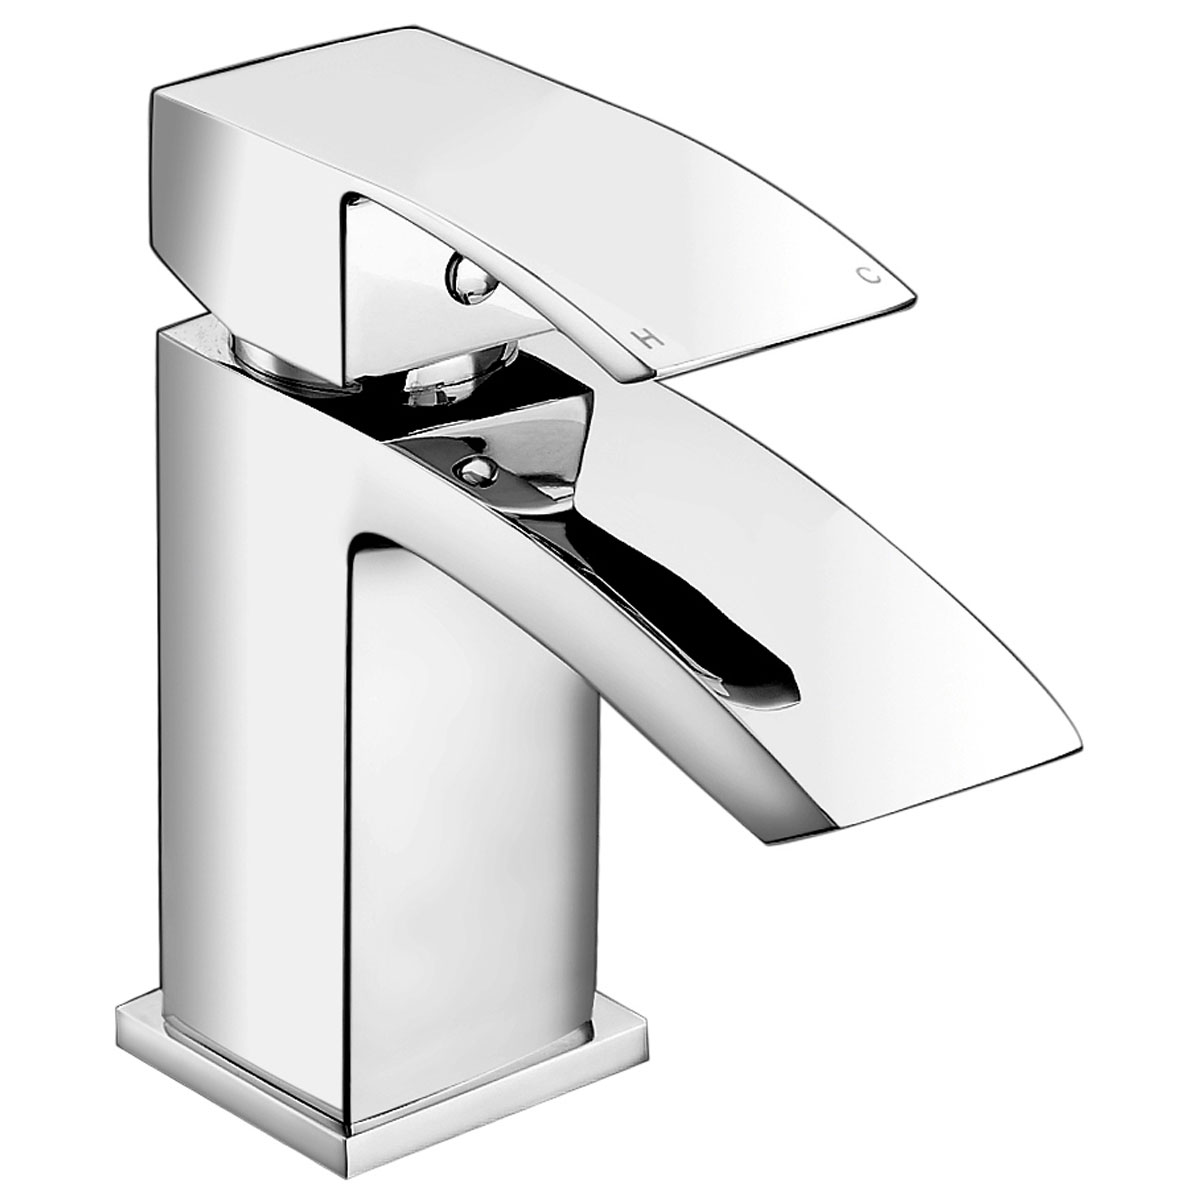 JTP Dash Basin Mixer Tap with Click Clack Waste Single Handle - Chrome